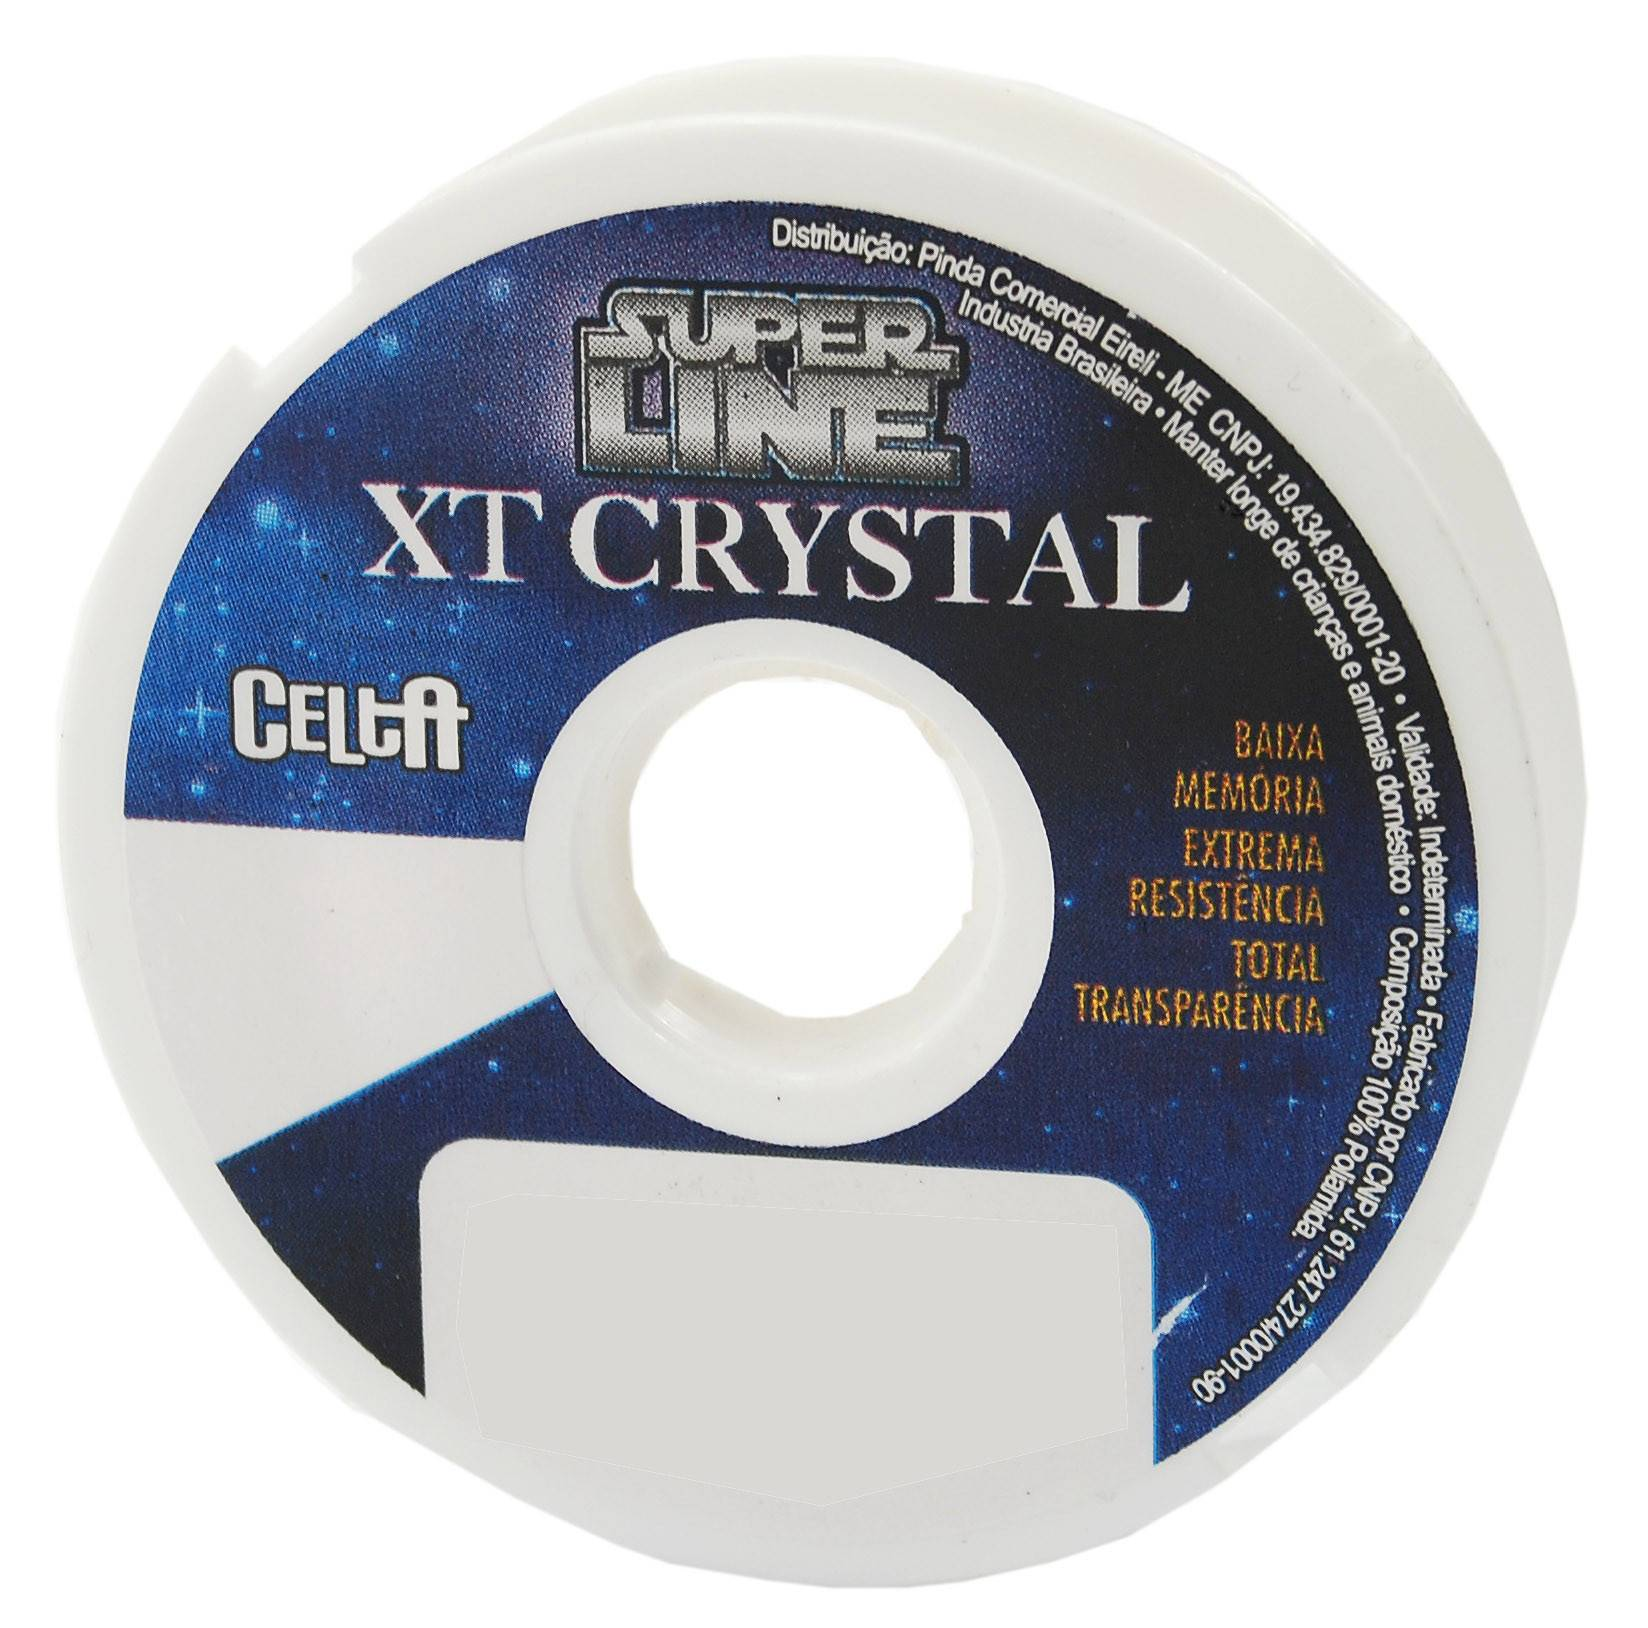 Linha Mono Celta XT Crystal e Titanium 0,37mm 21,5lbs/9,8kg - 120 Metros